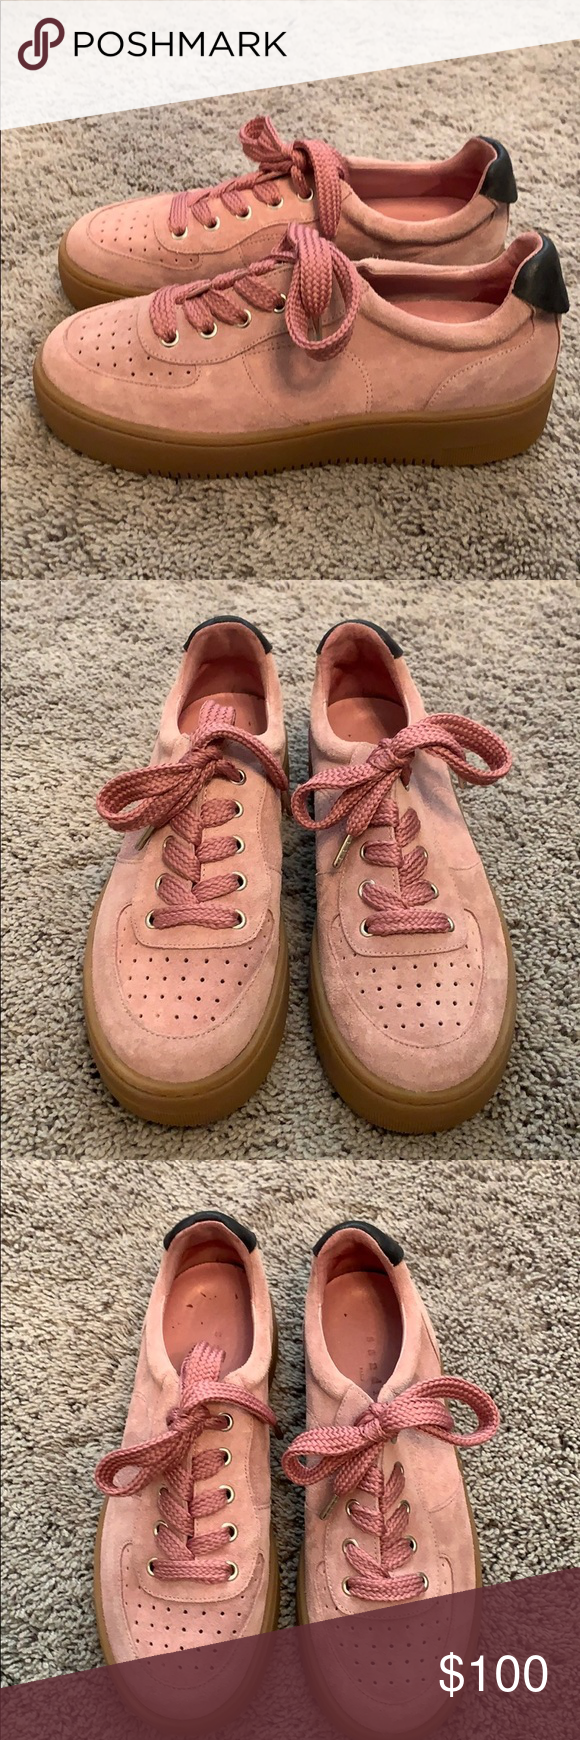 Sandro womens pink suede sneakers in